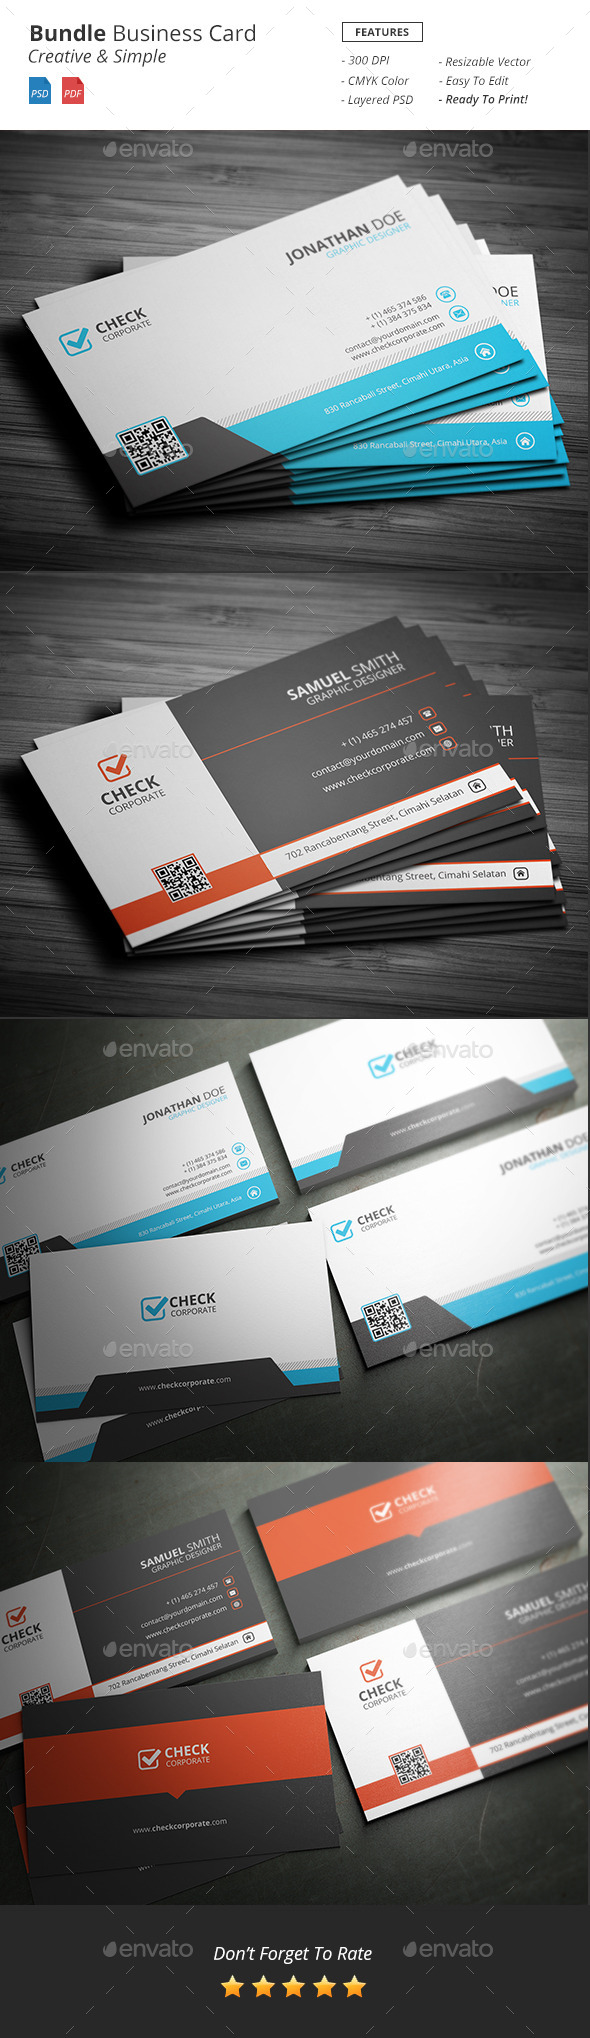 Bundle Business Card - Business Cards Print Templates